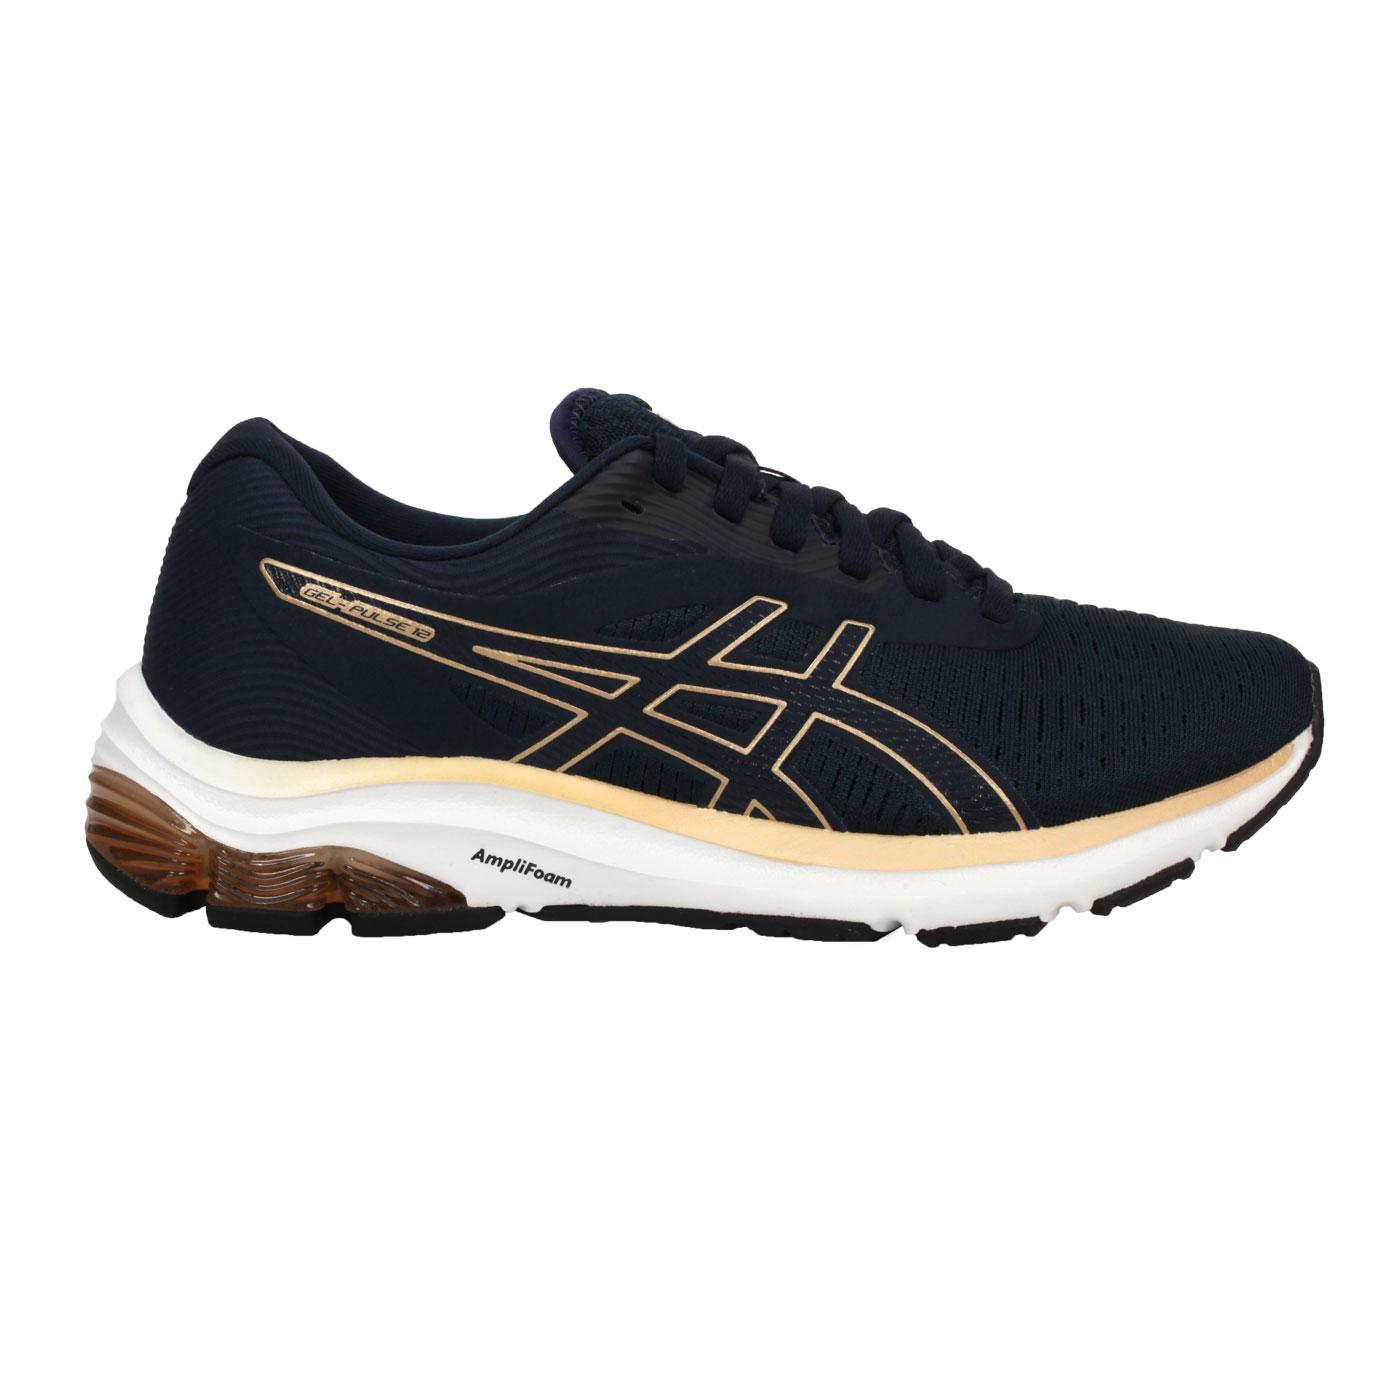 ASICS 女款慢跑鞋  @GEL-PULSE 12@1012A724-403 - 藍綠金黃